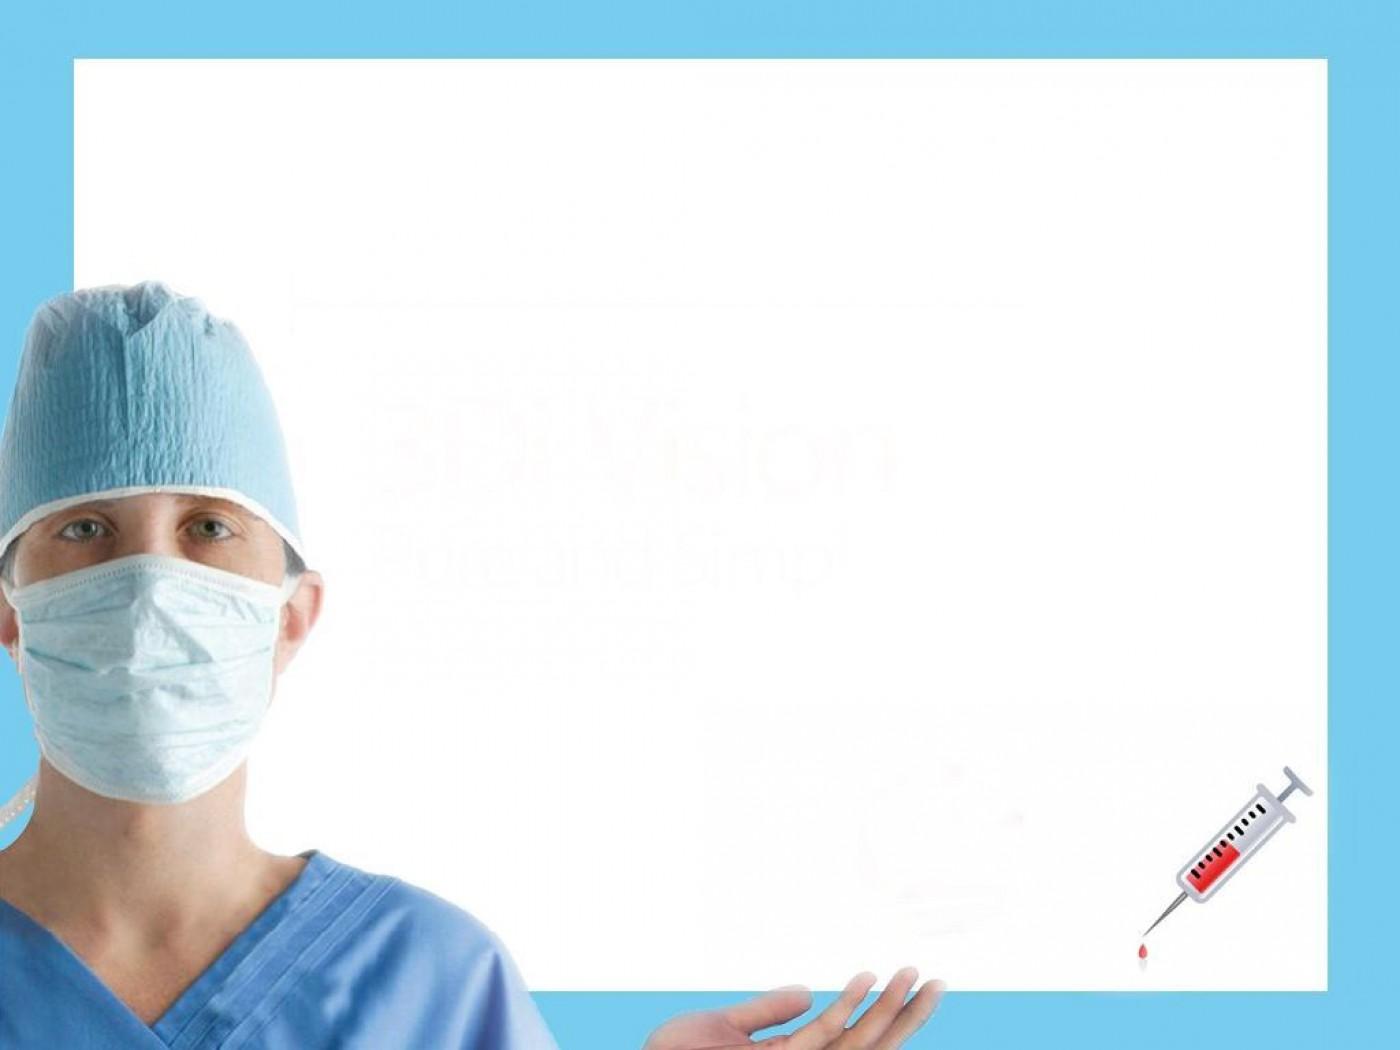 003 Wonderful Free Nursing Powerpoint Template High Resolution  Education Download1400